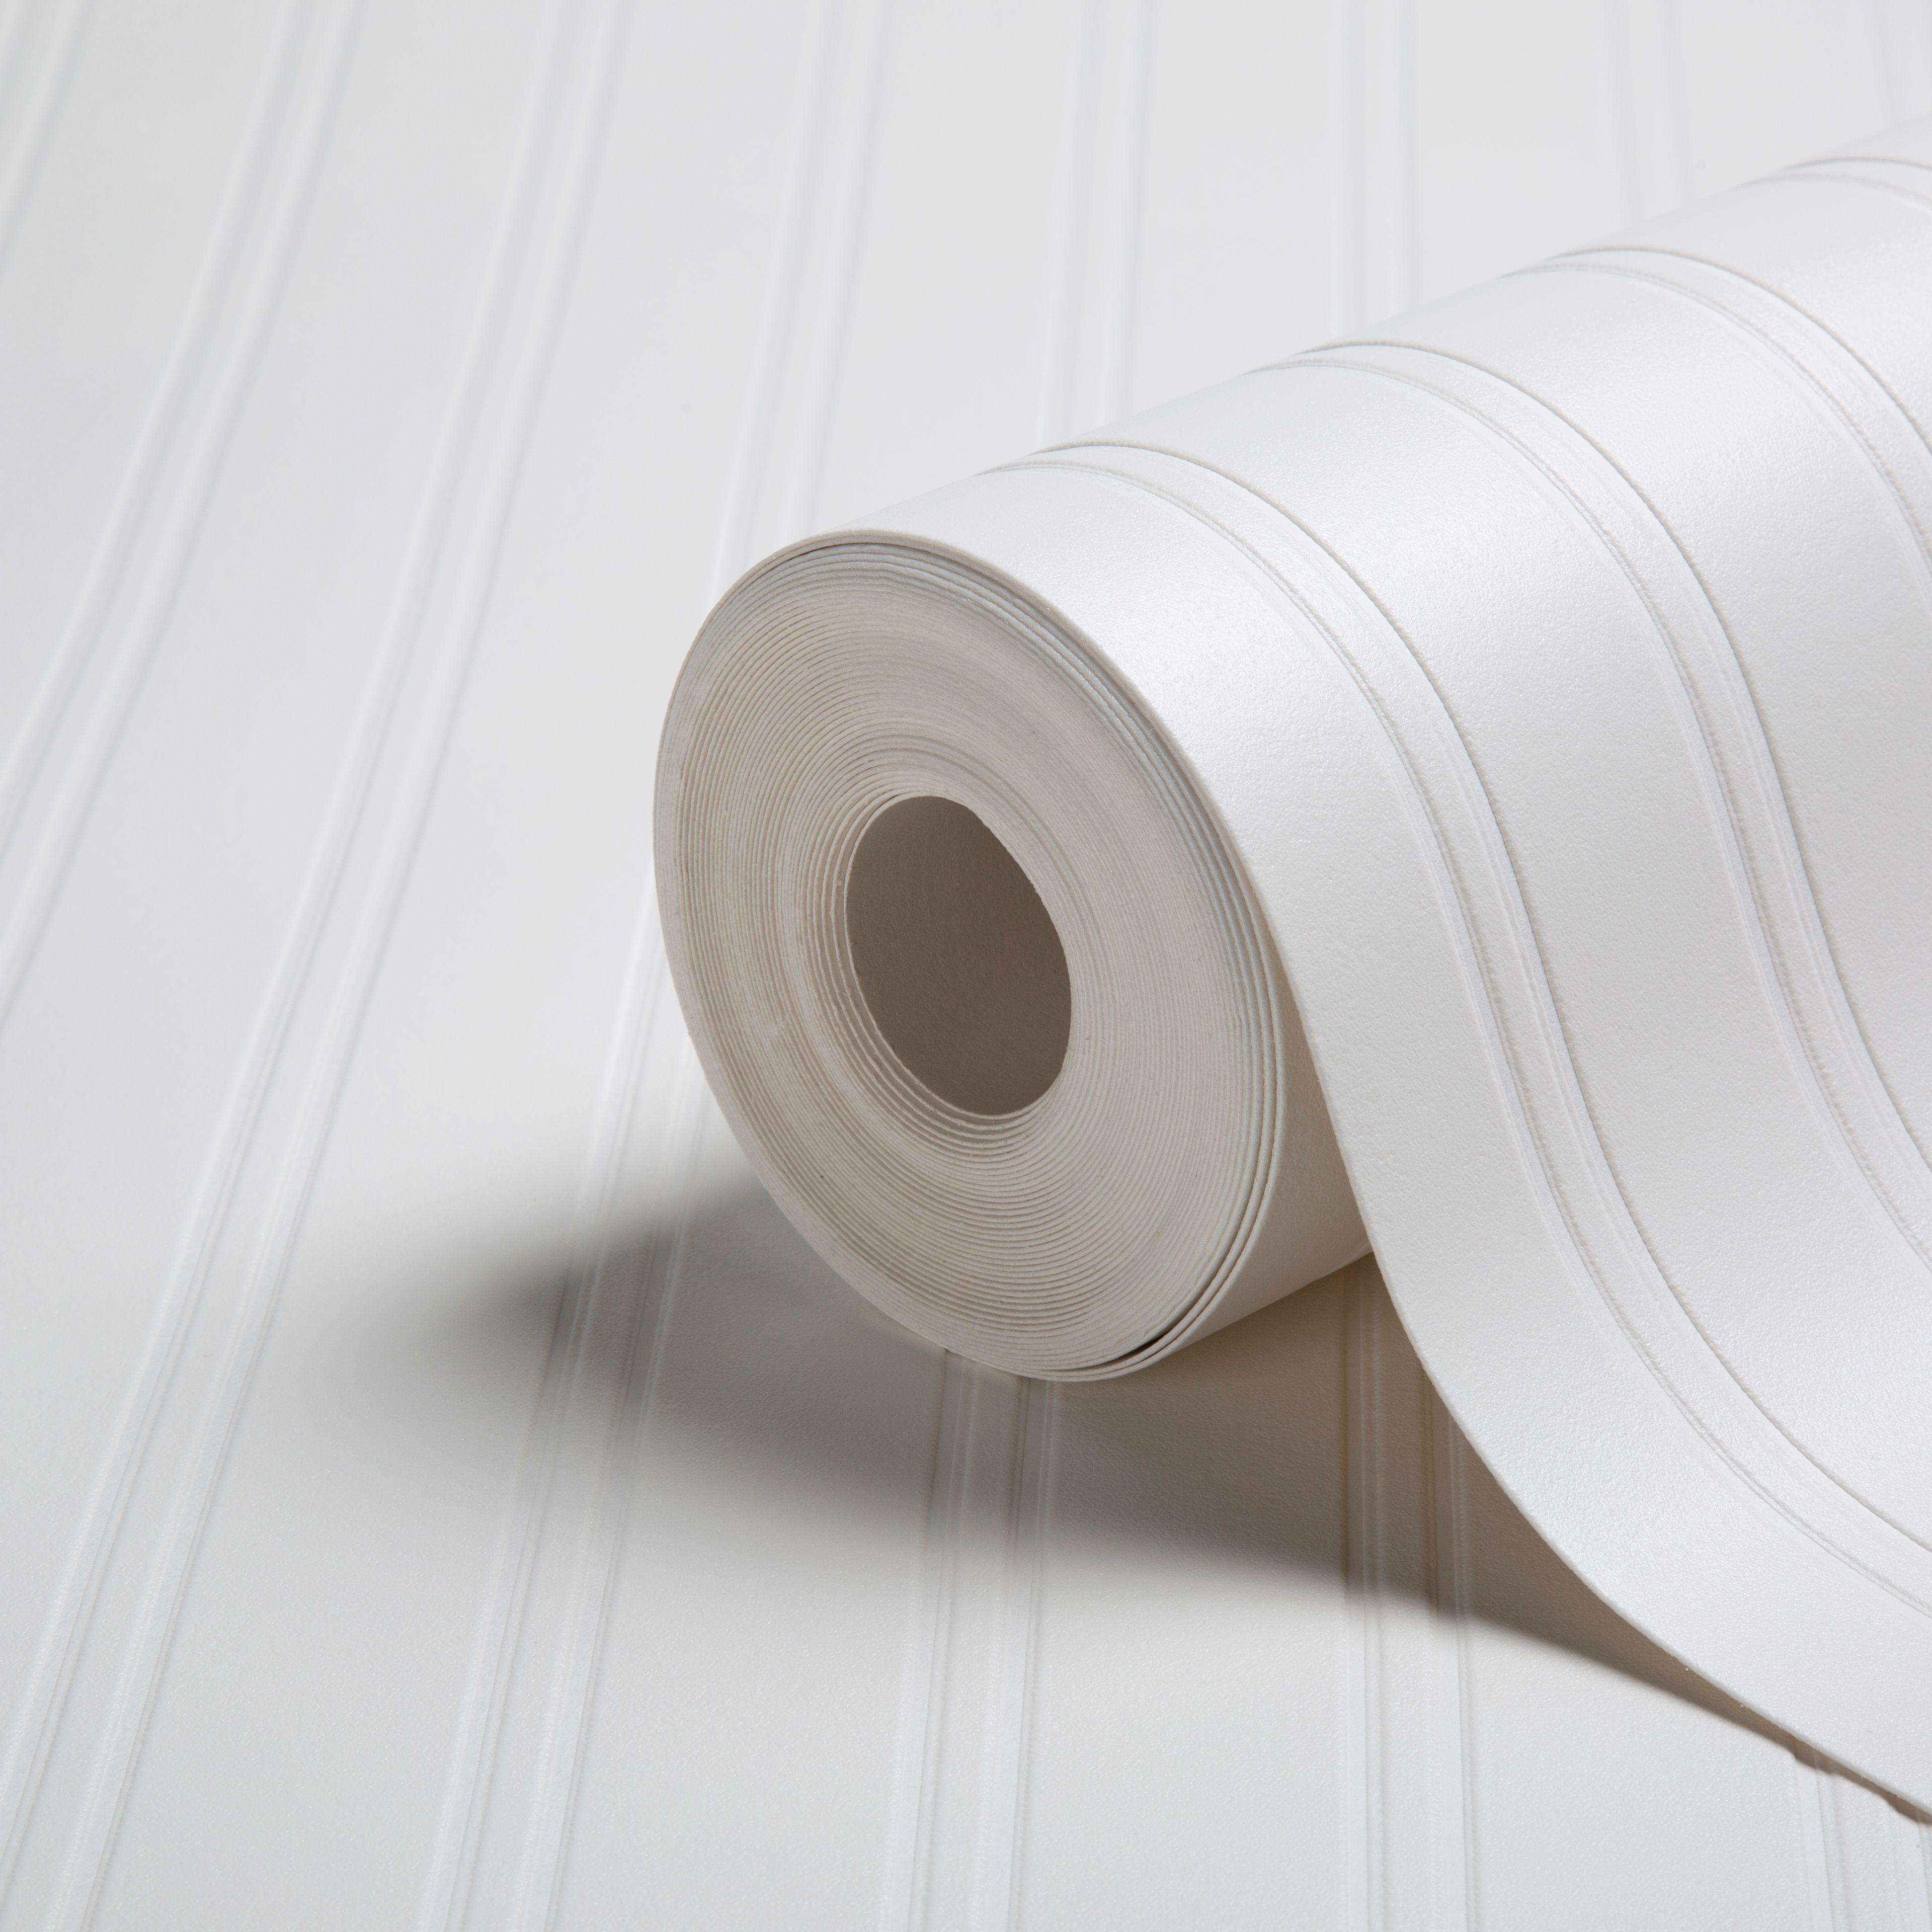 Walldoctor Beadboard White Striped Textured Paintable Wallpaper